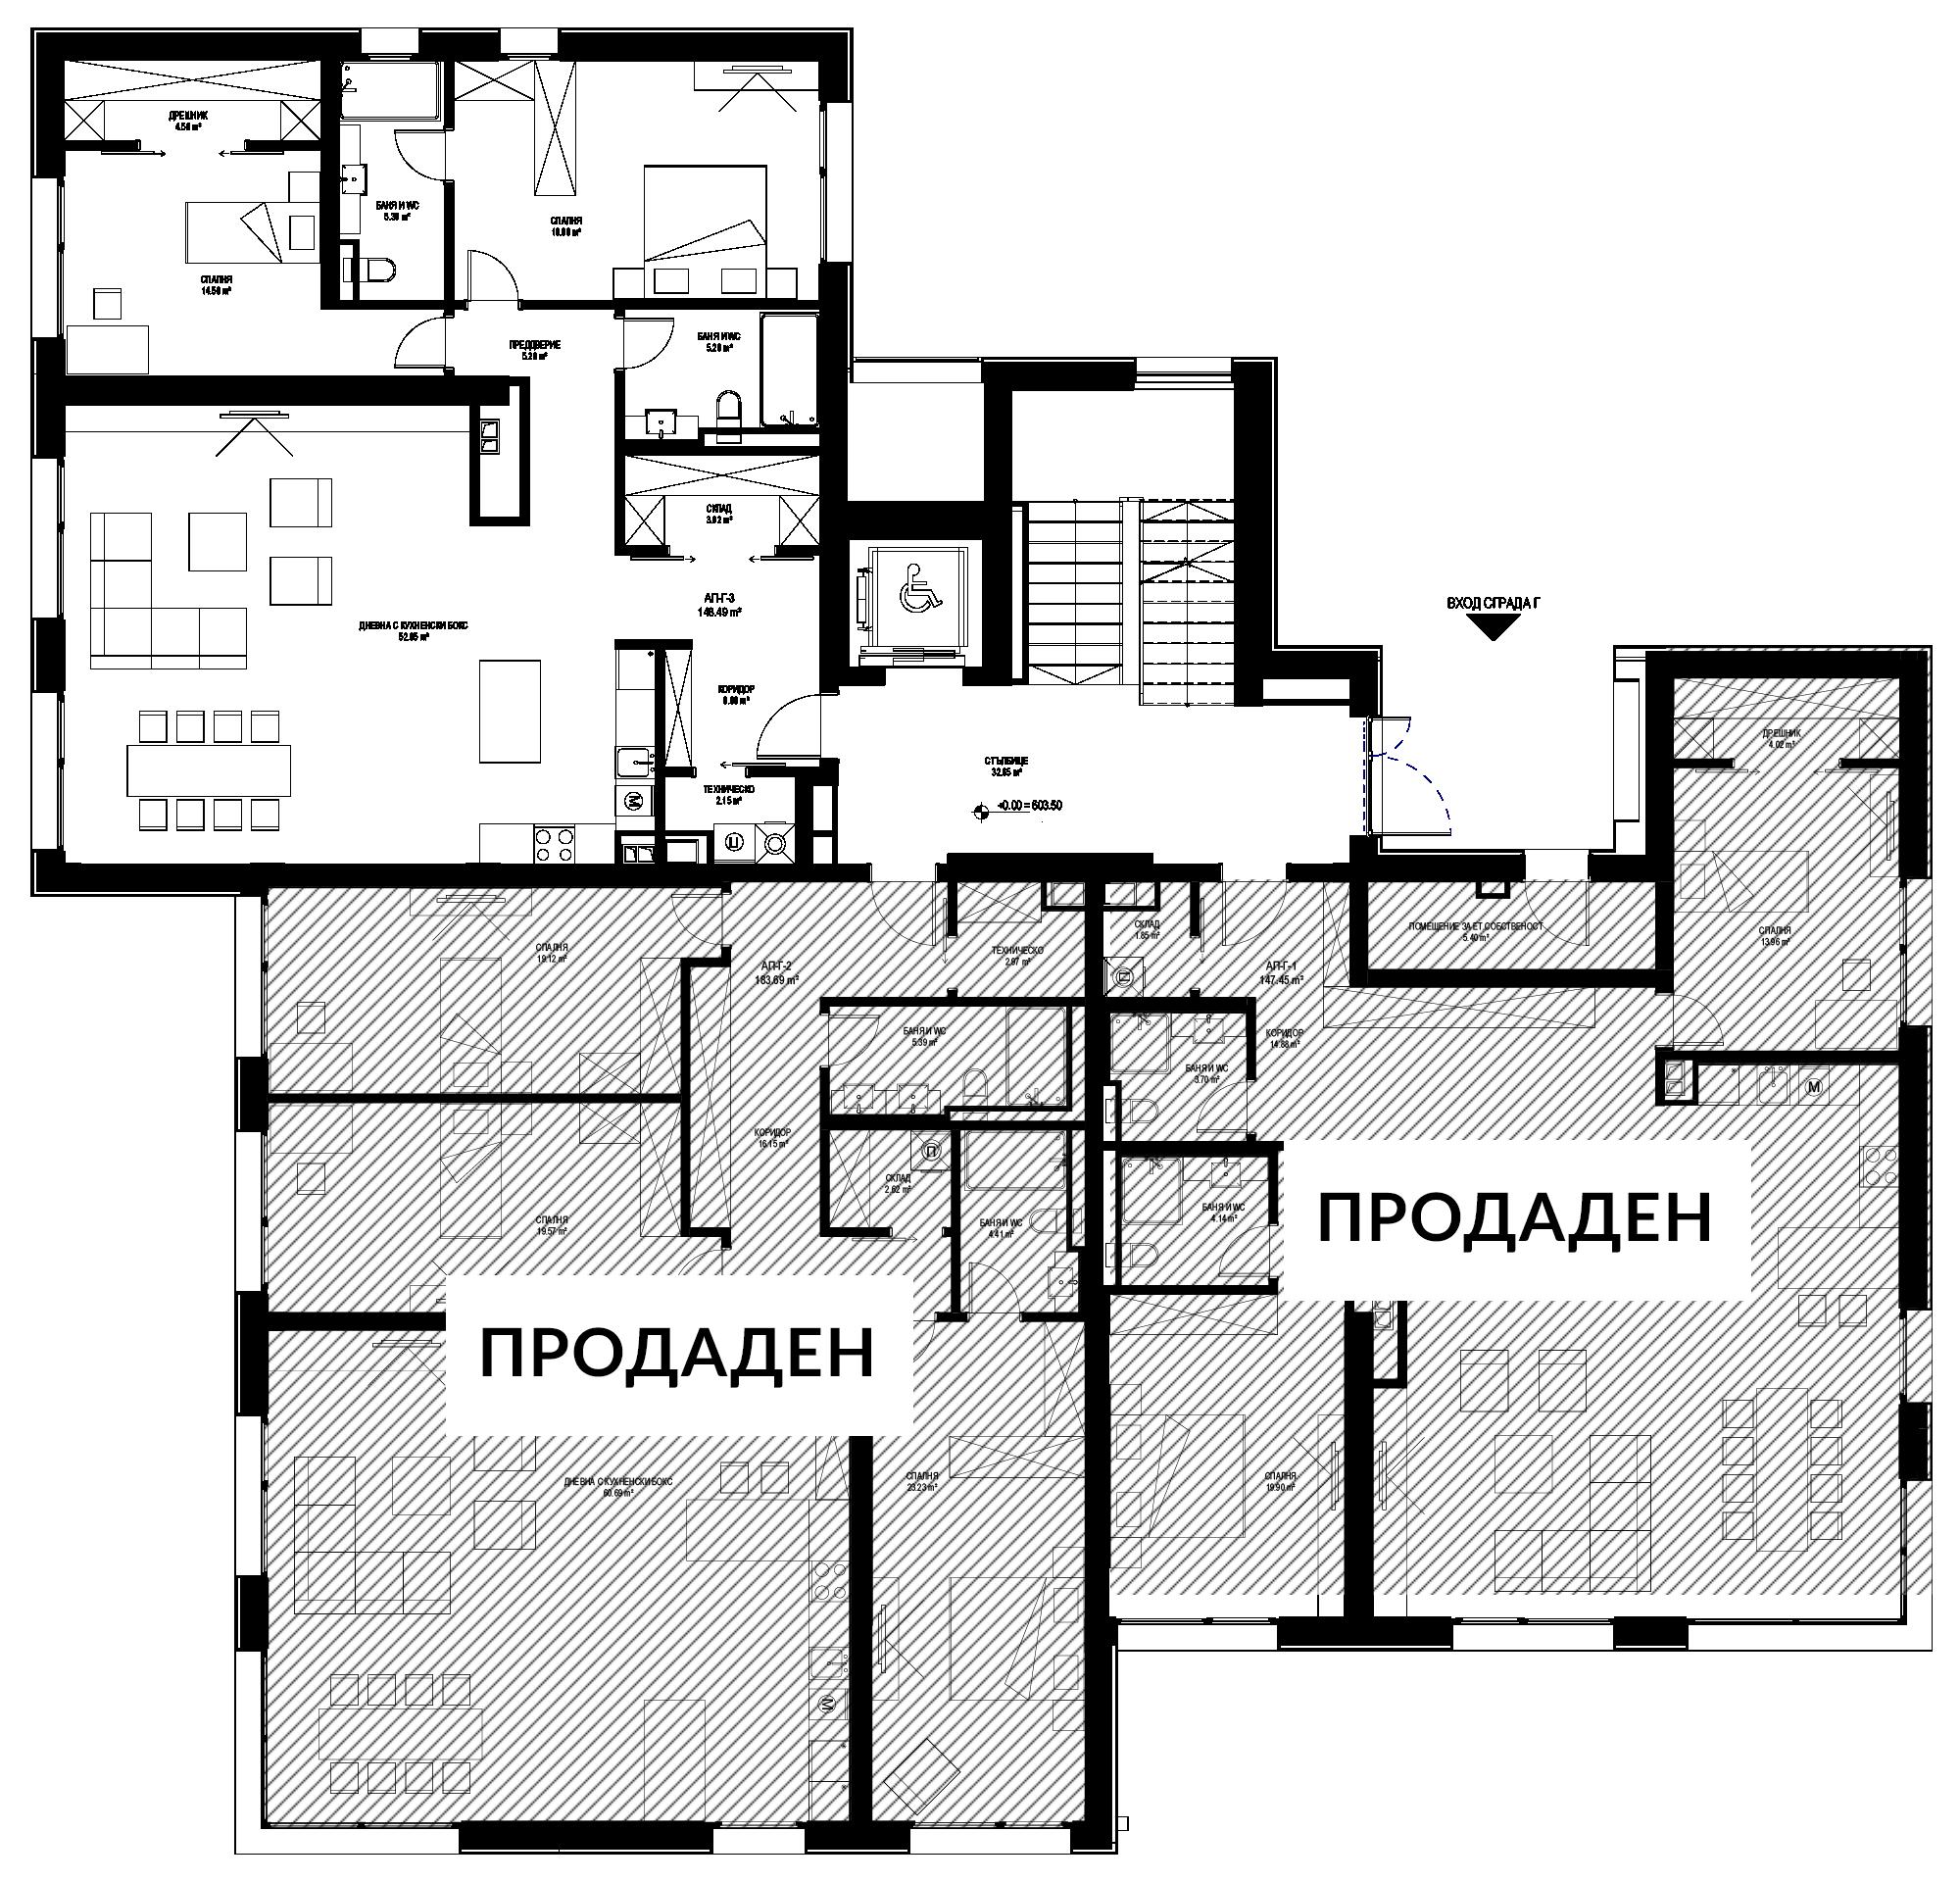 A - Етаж 1 1